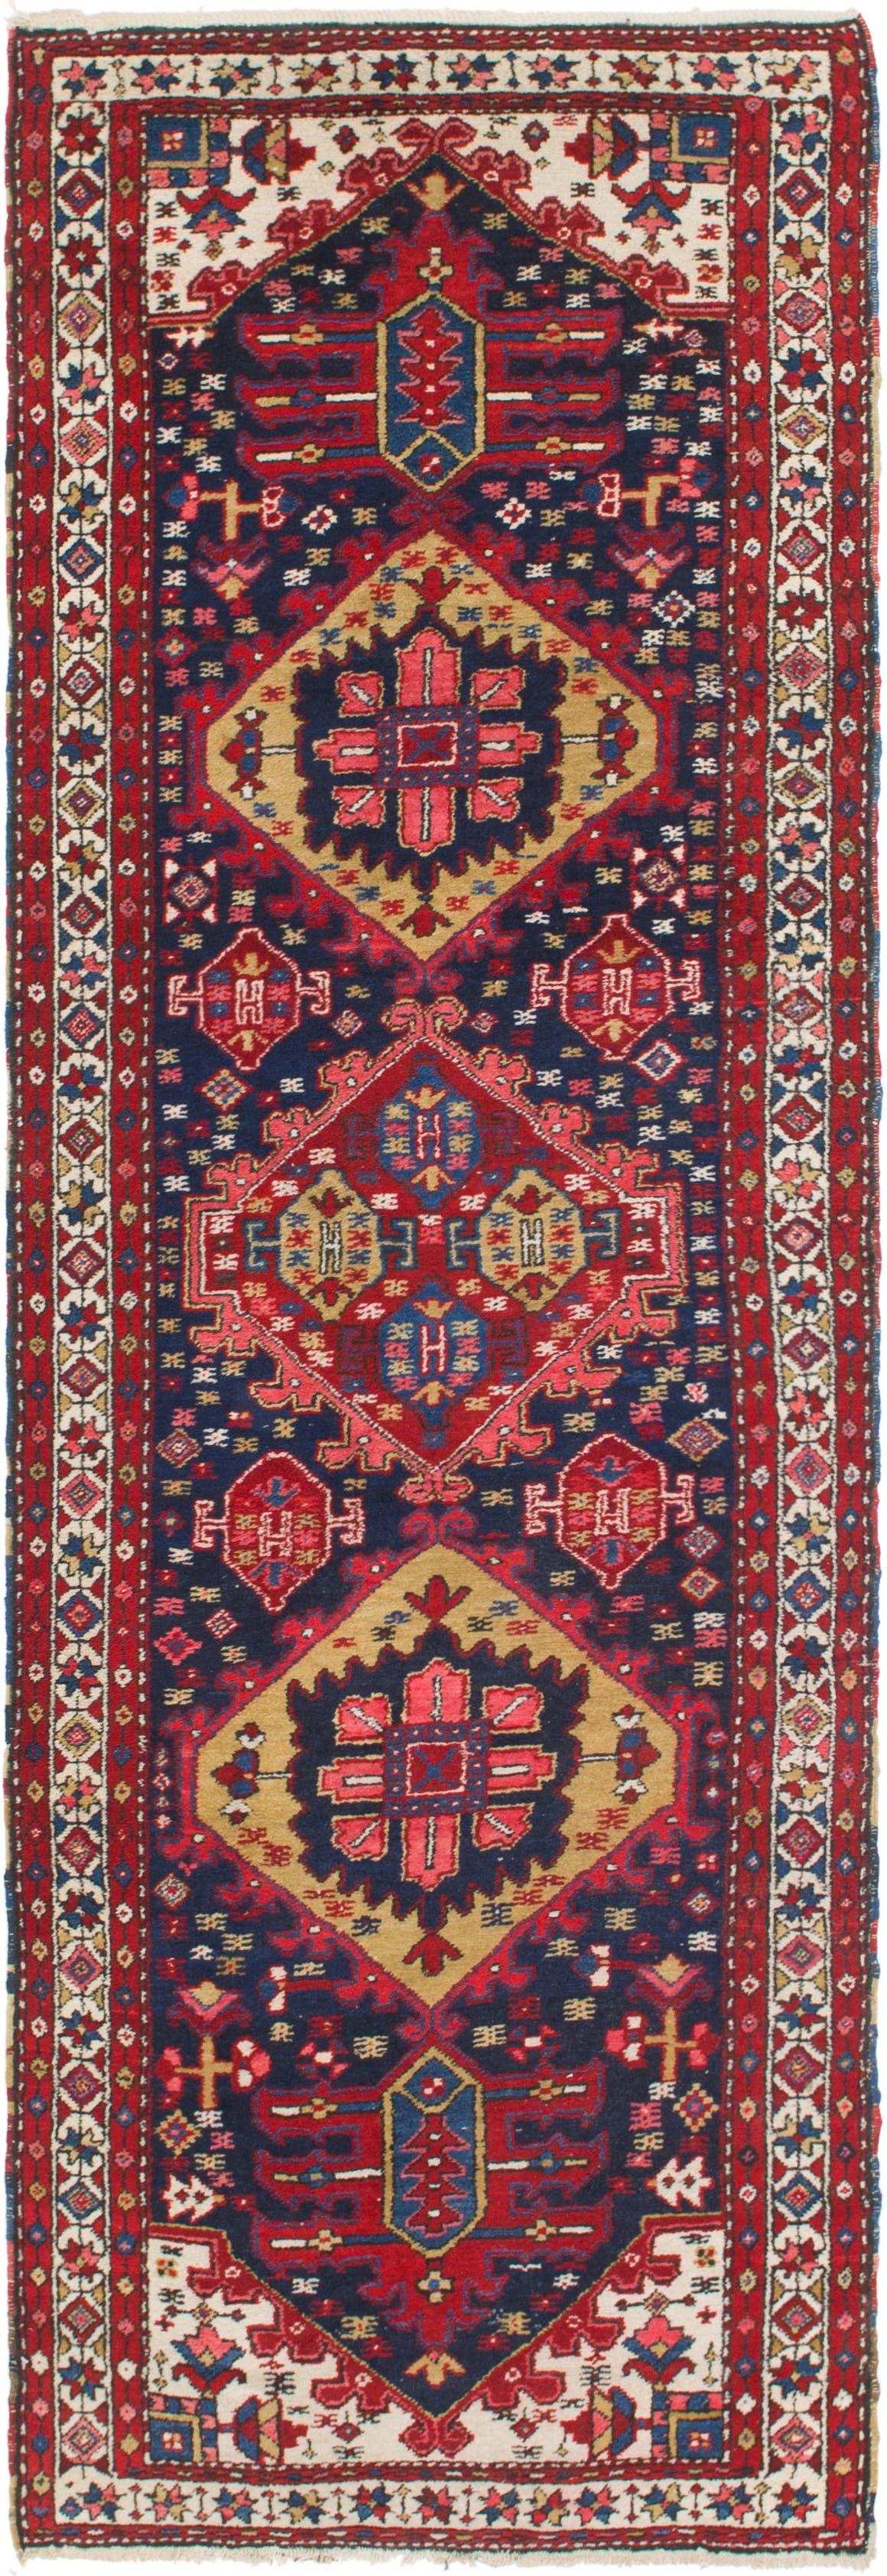 3' 3 x 10' 2 Bakhtiar Persian Runner Rug main image